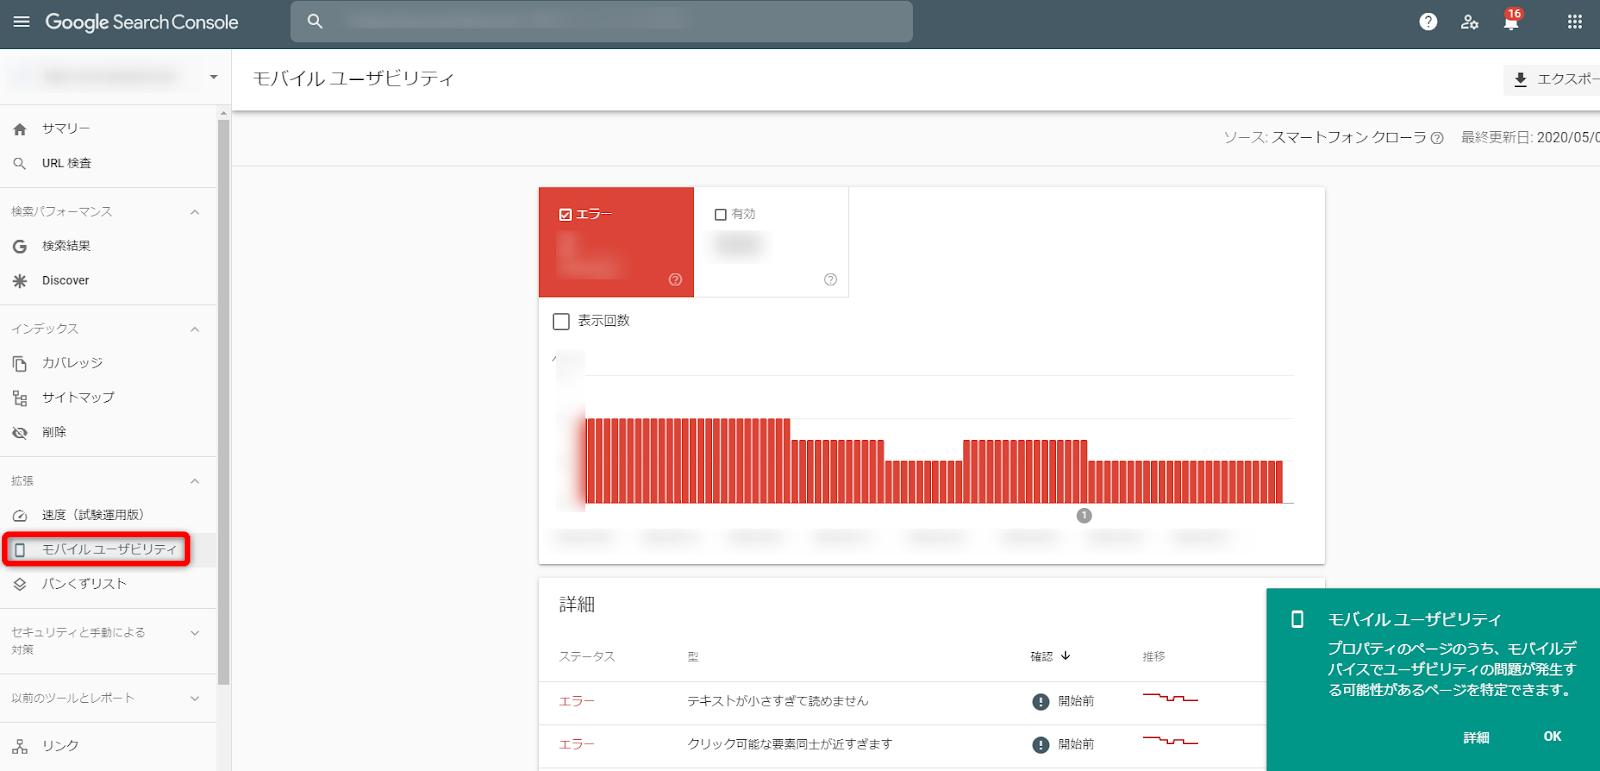 Google Search Consouleのモバイルユーザビリティのスクリーンショット